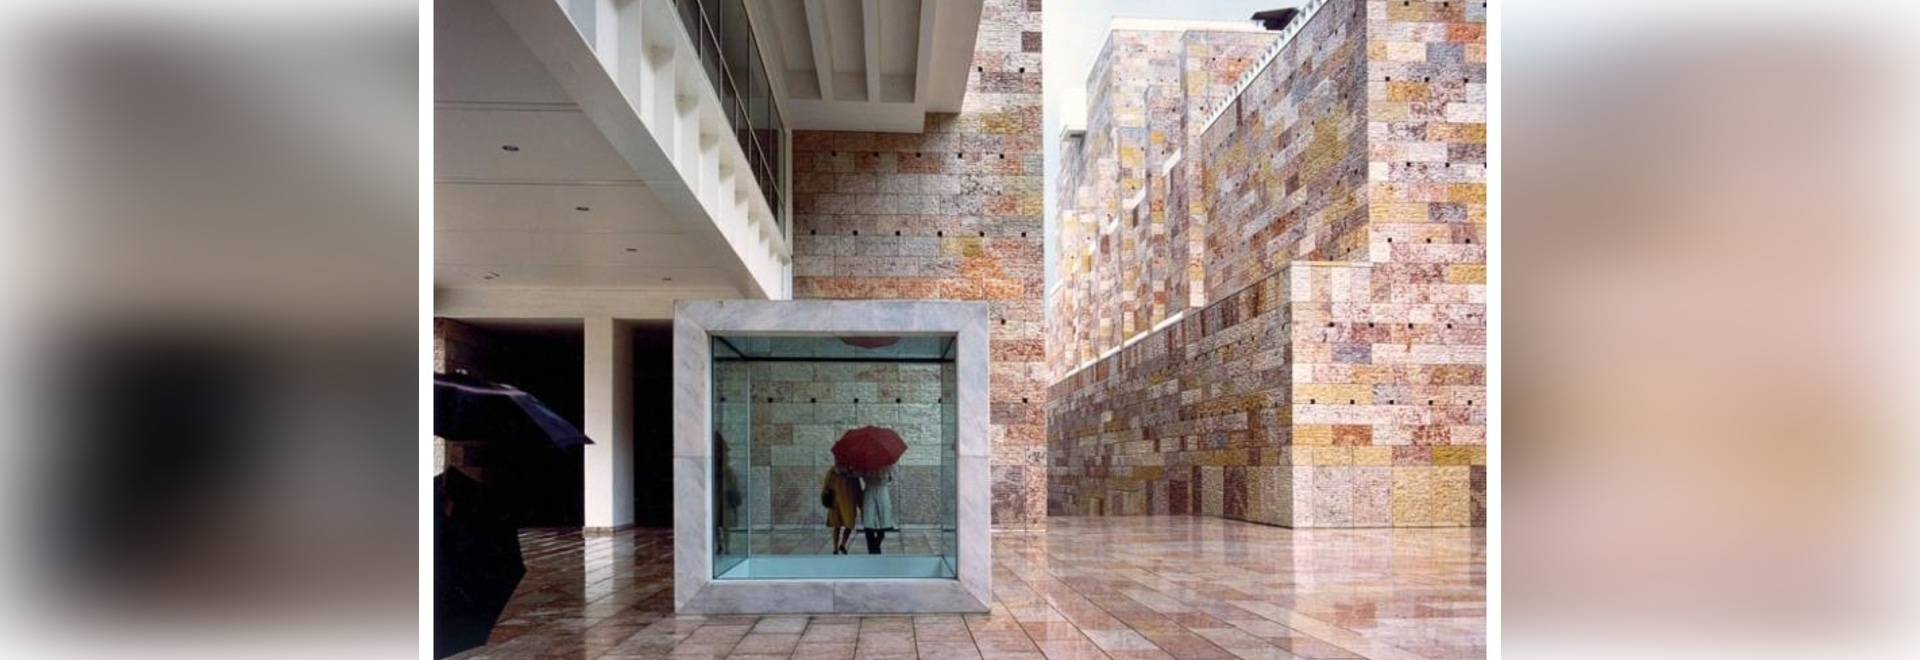 Gregotti Associati: Belém Cultural Centre (with Risco SA / Salgado), Lisbon, 1995